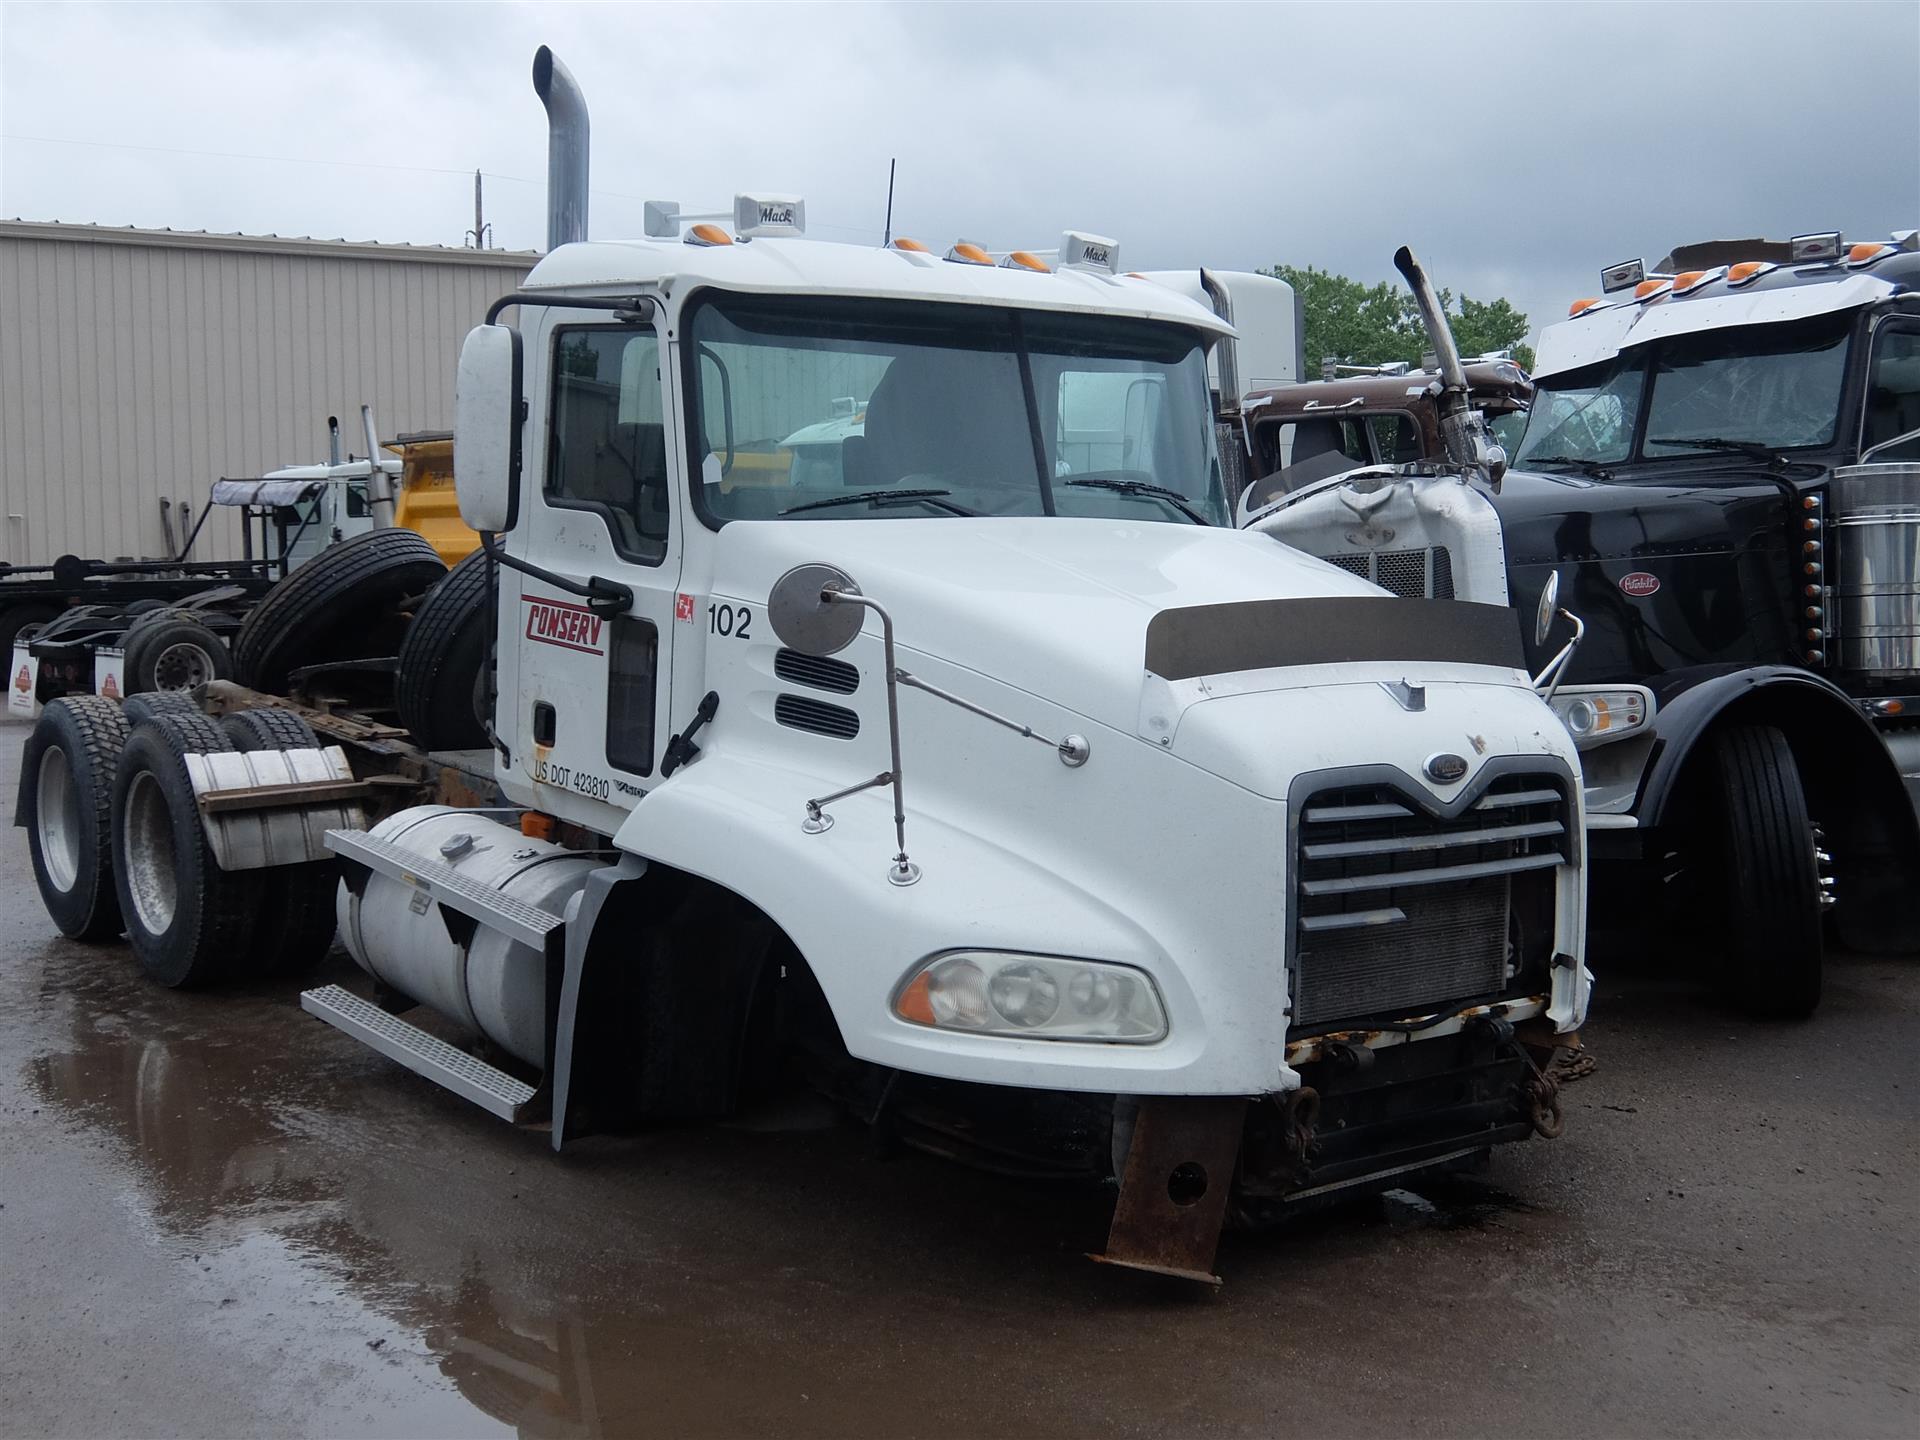 2004 Mack cx613 for sale-59085175